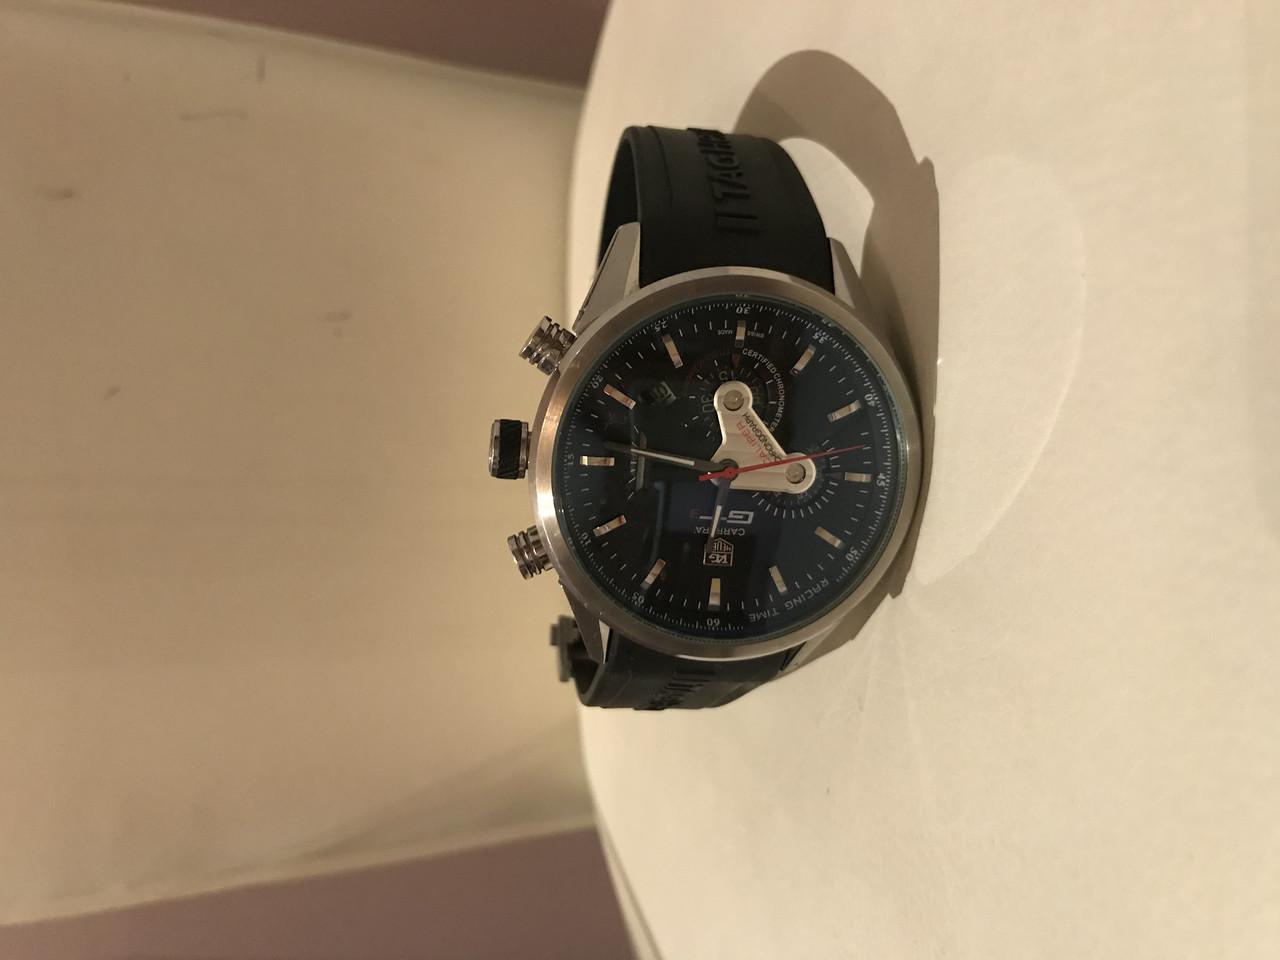 31fc1401808f Продам Часы мужские., цена 2 200 грн., купить — Prom.ua (ID 749252273)